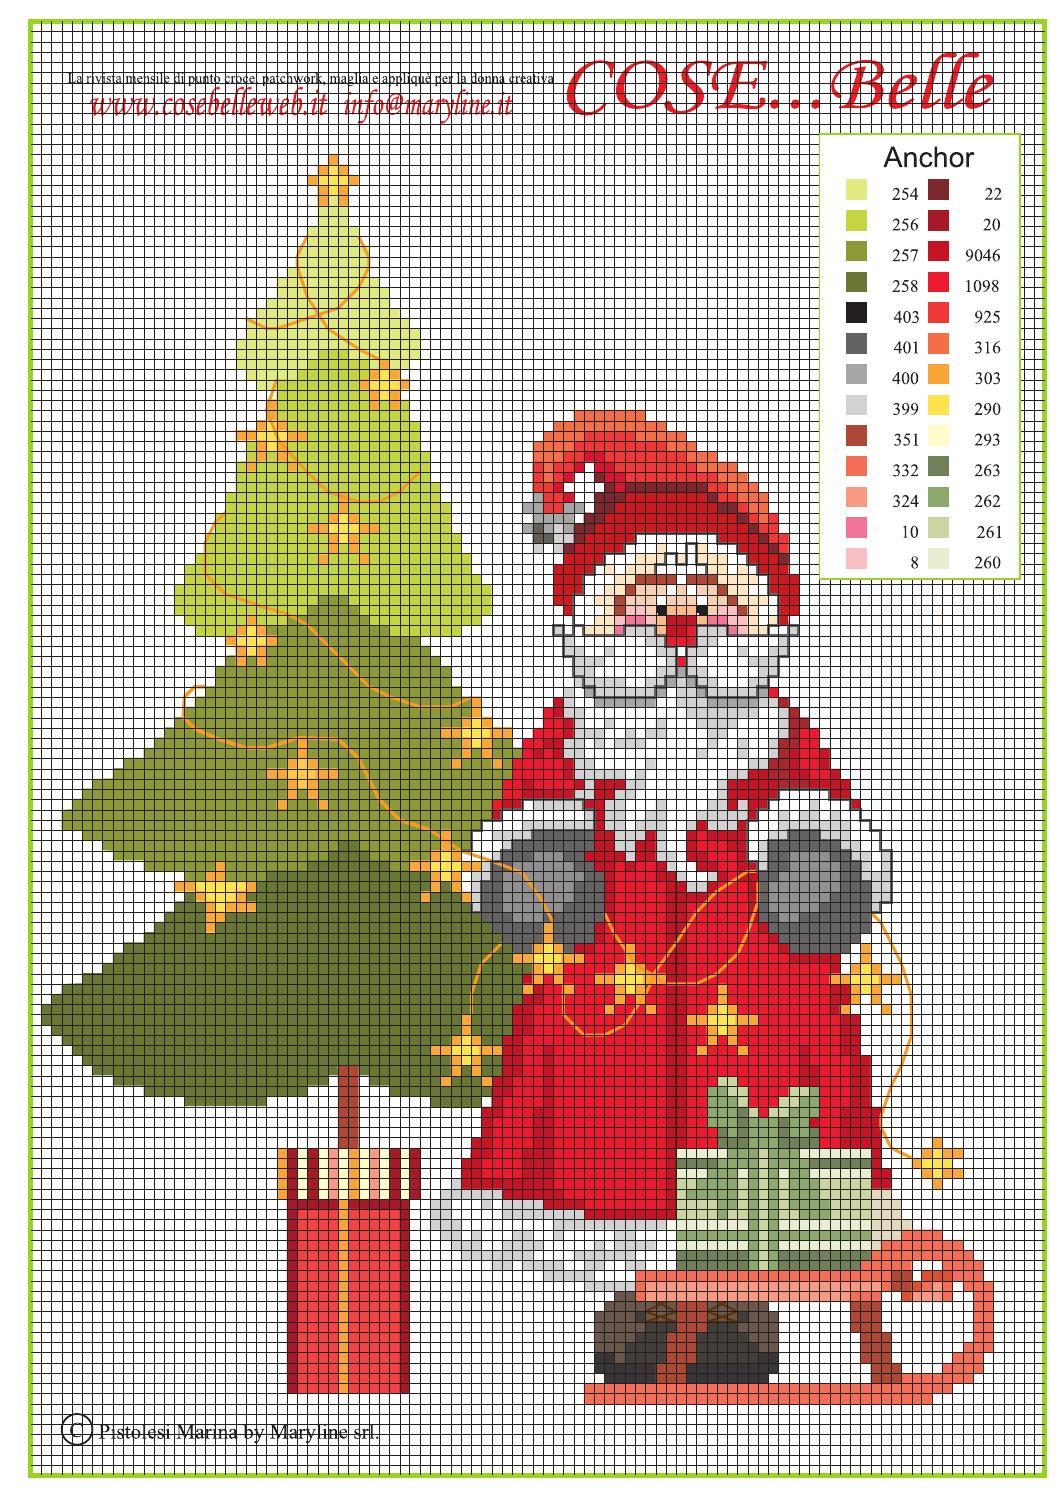 Santa 2014 free cross stitch pattern by maryline s r l for Farfalle punto croce schemi gratis